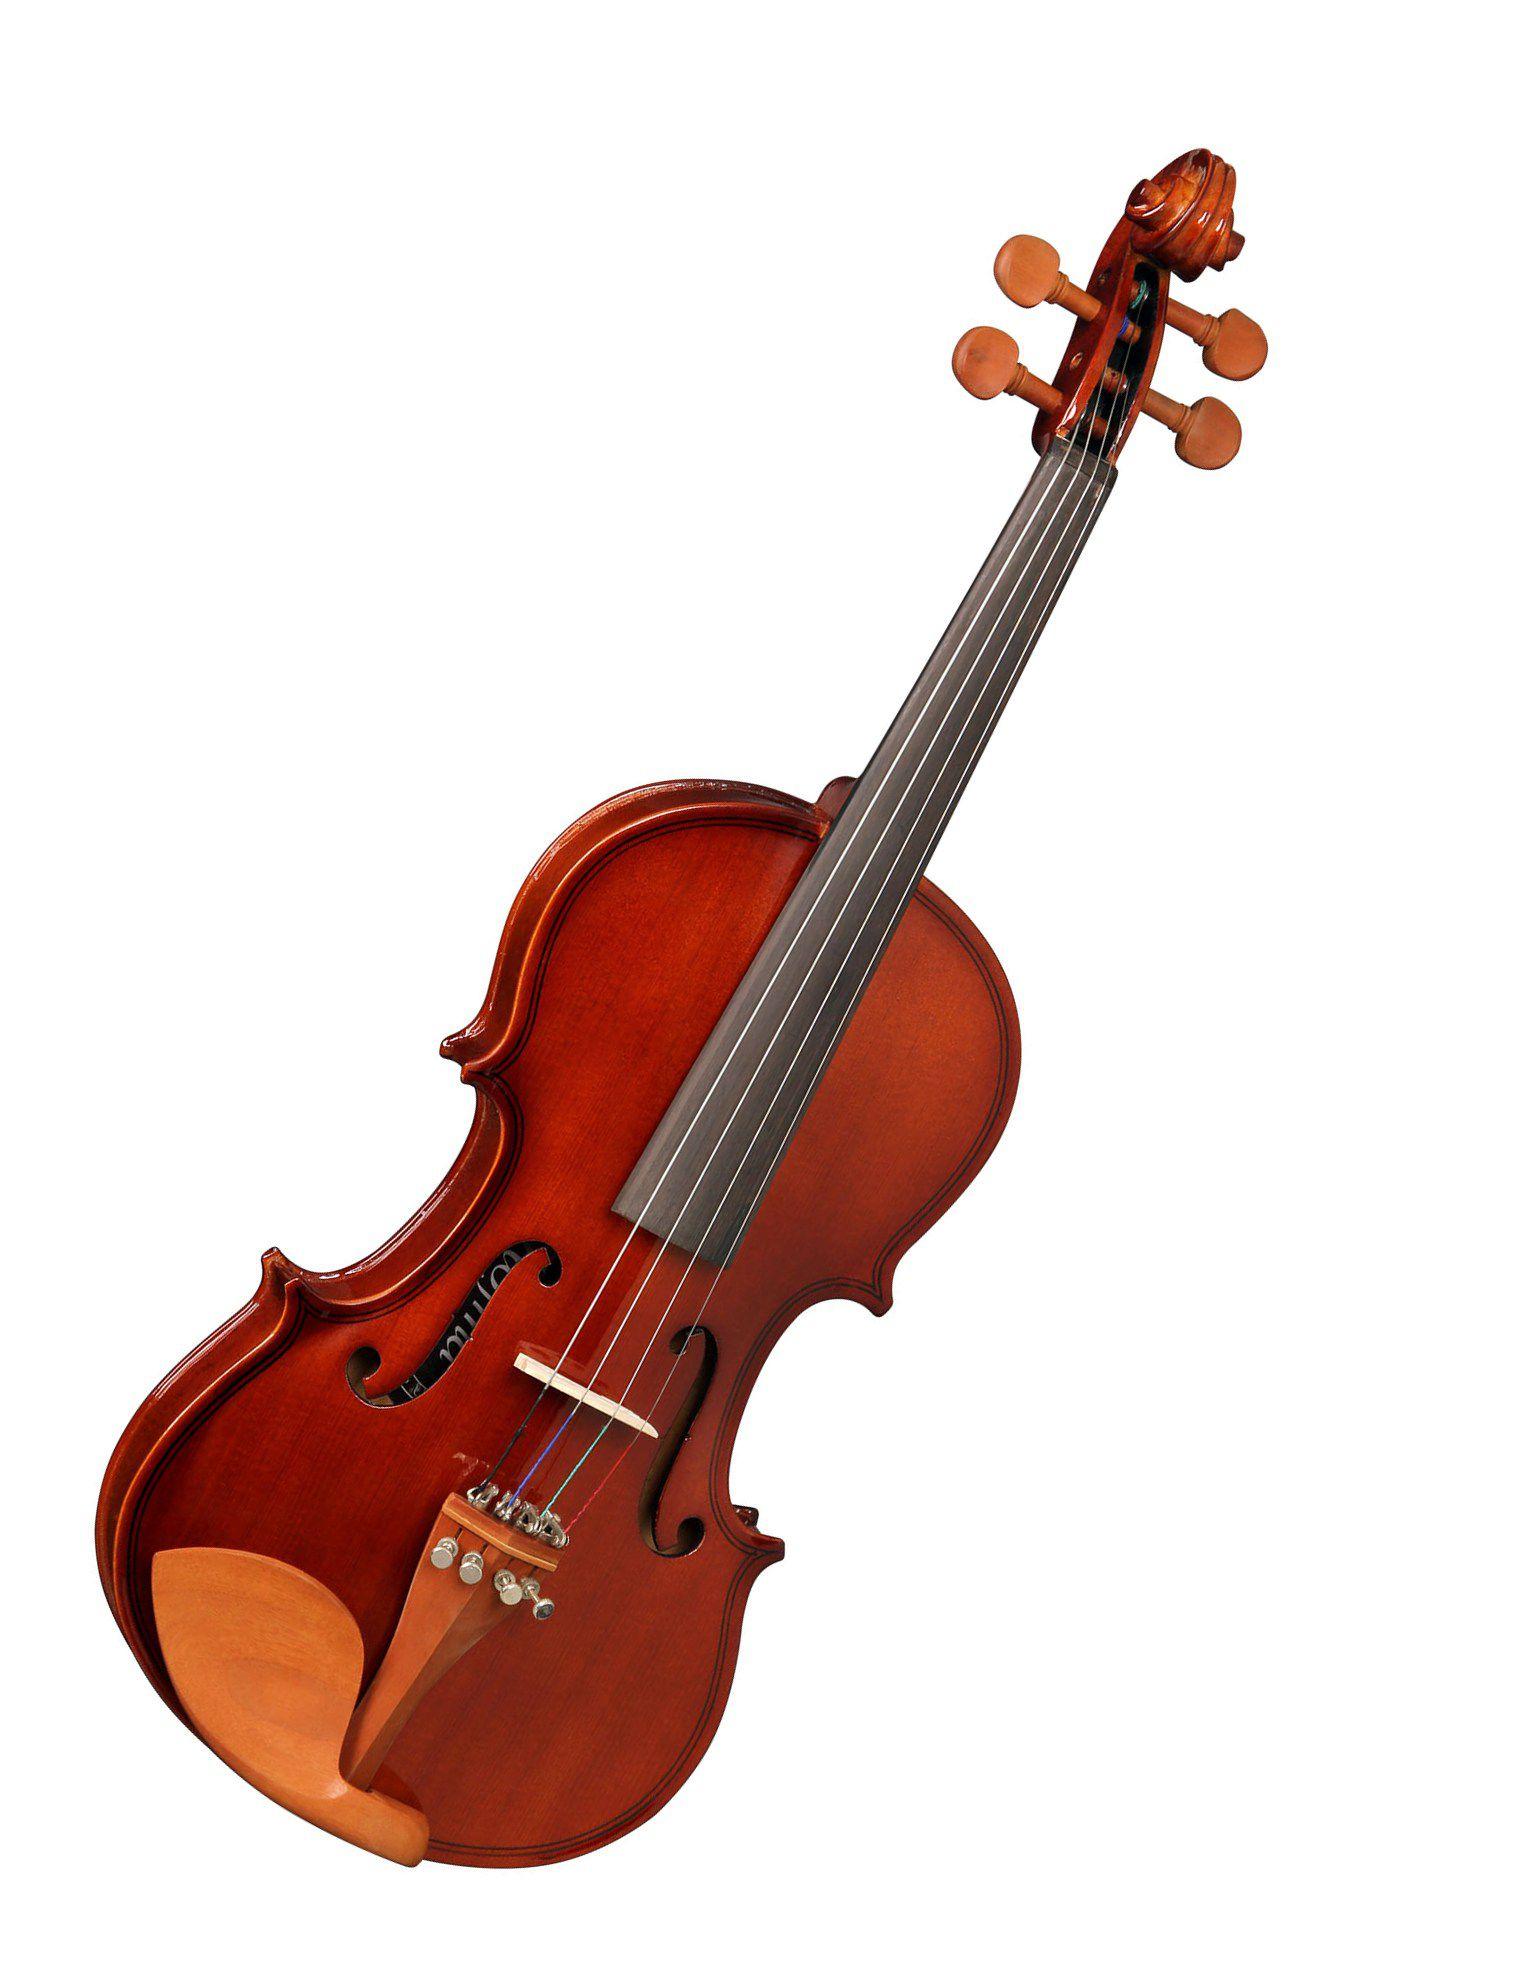 Violino Hofma Hve221 1/2 Estudante Completo